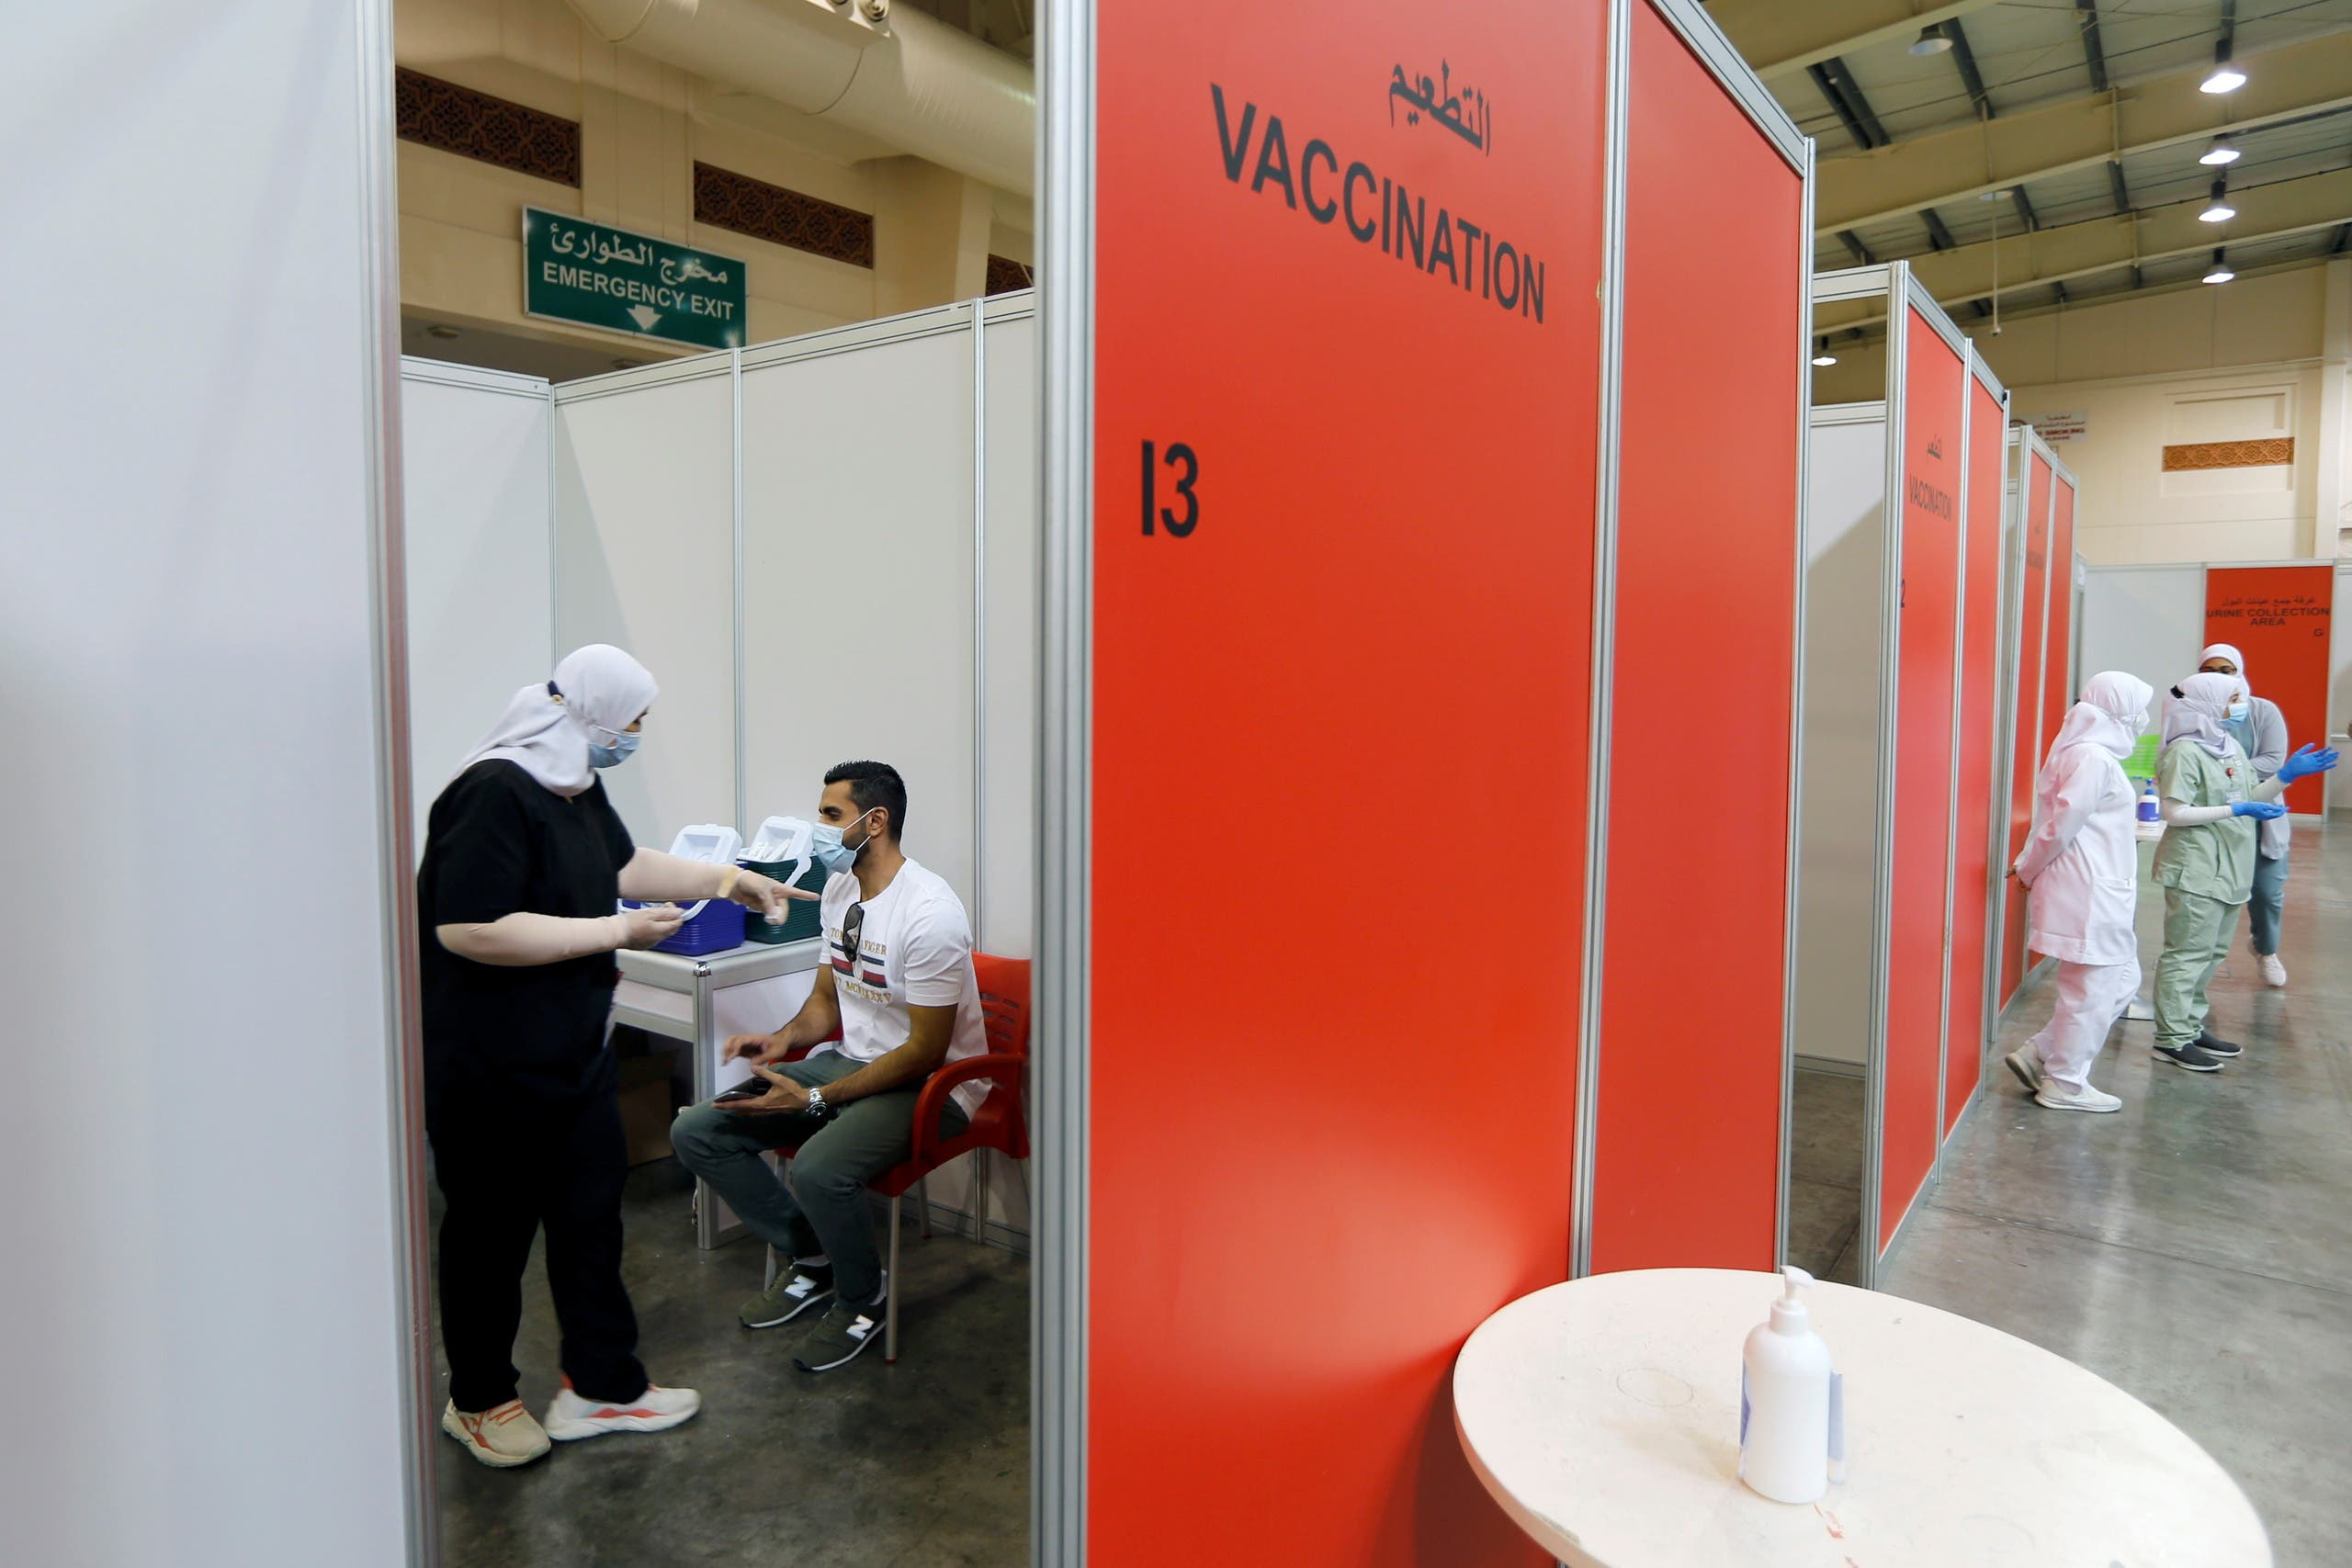 A Bahraini man waits to get a dose of a coronavirus disease (COVID-19) vaccine, at Bahrain International Exhibition & Convention Centre (BIECC), in Manama. (Reuters)